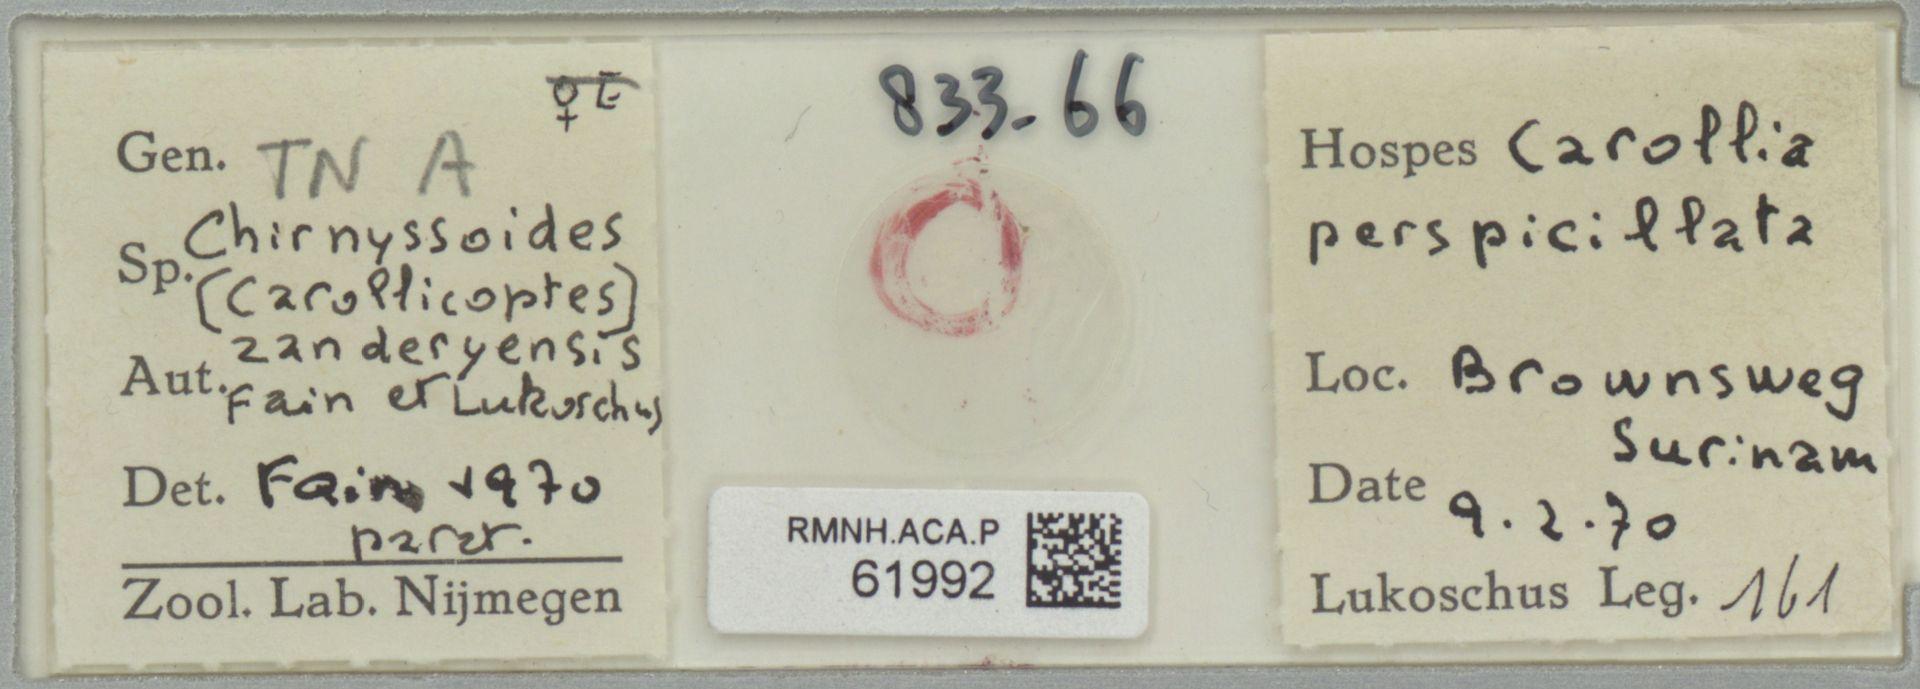 RMNH.ACA.P.61992   Chirnyssoides (Carrolicoptes) zanderyensis Fain et Lukoschus